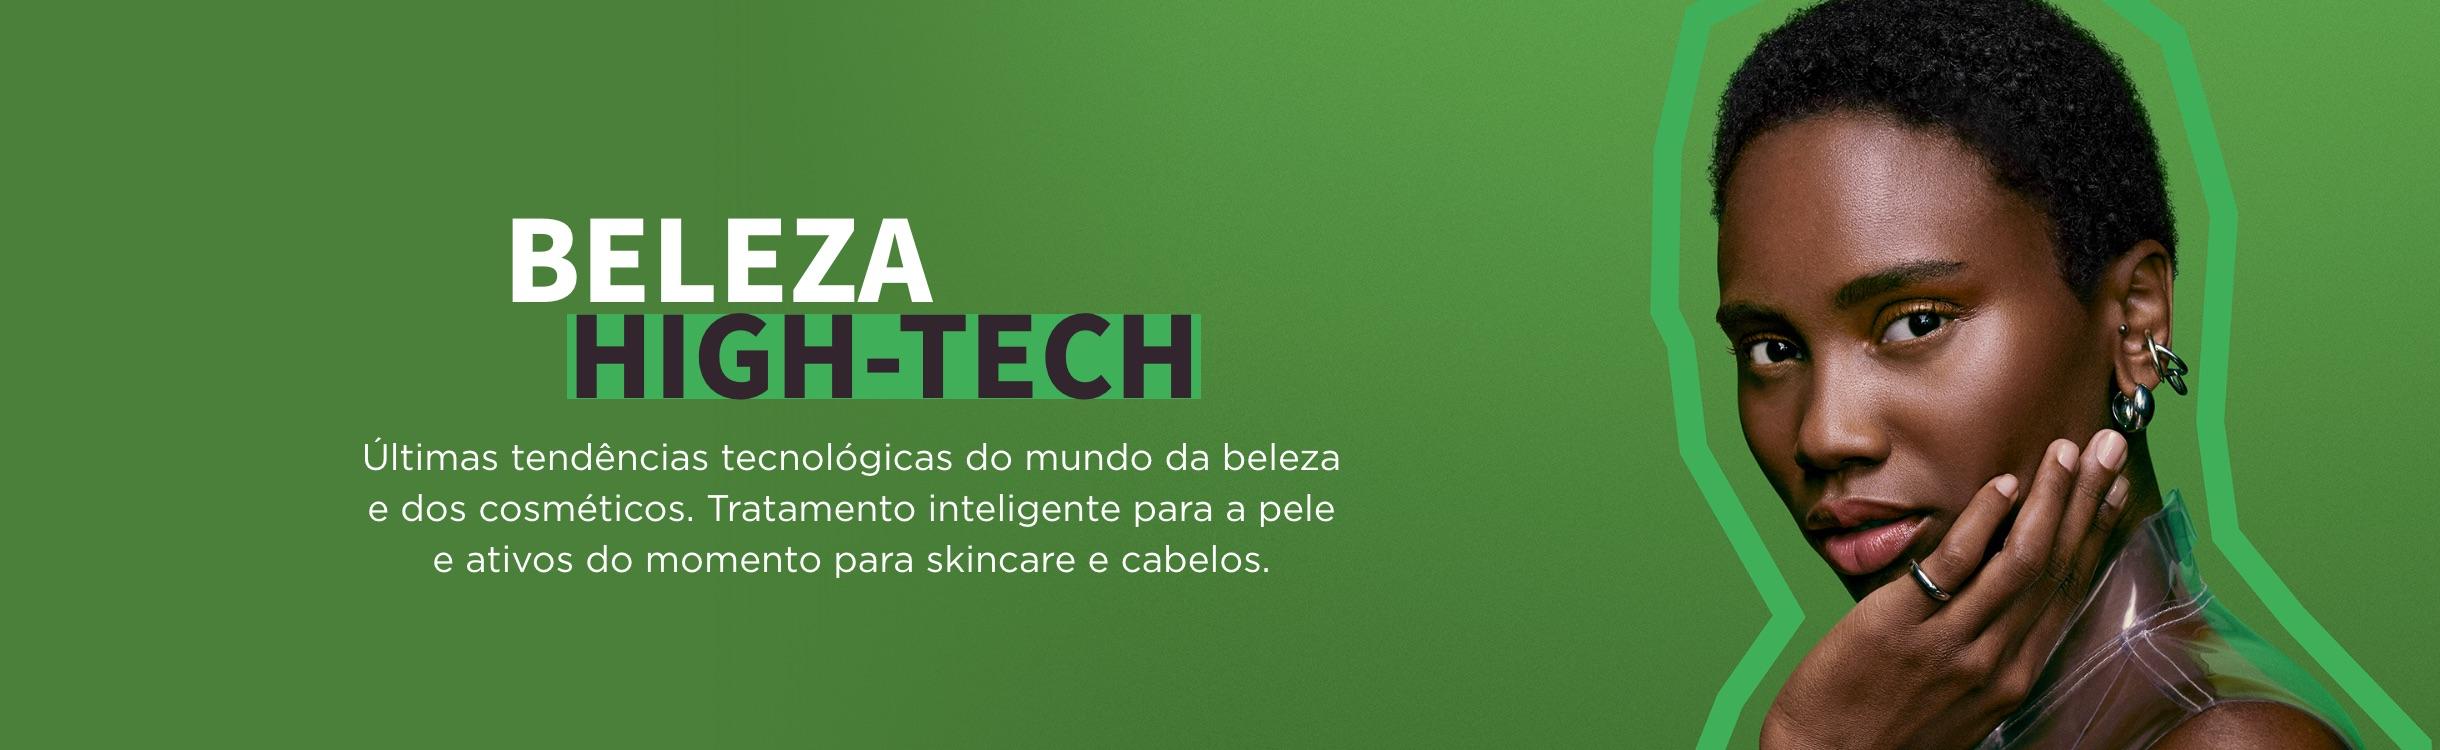 Beleza High Tech